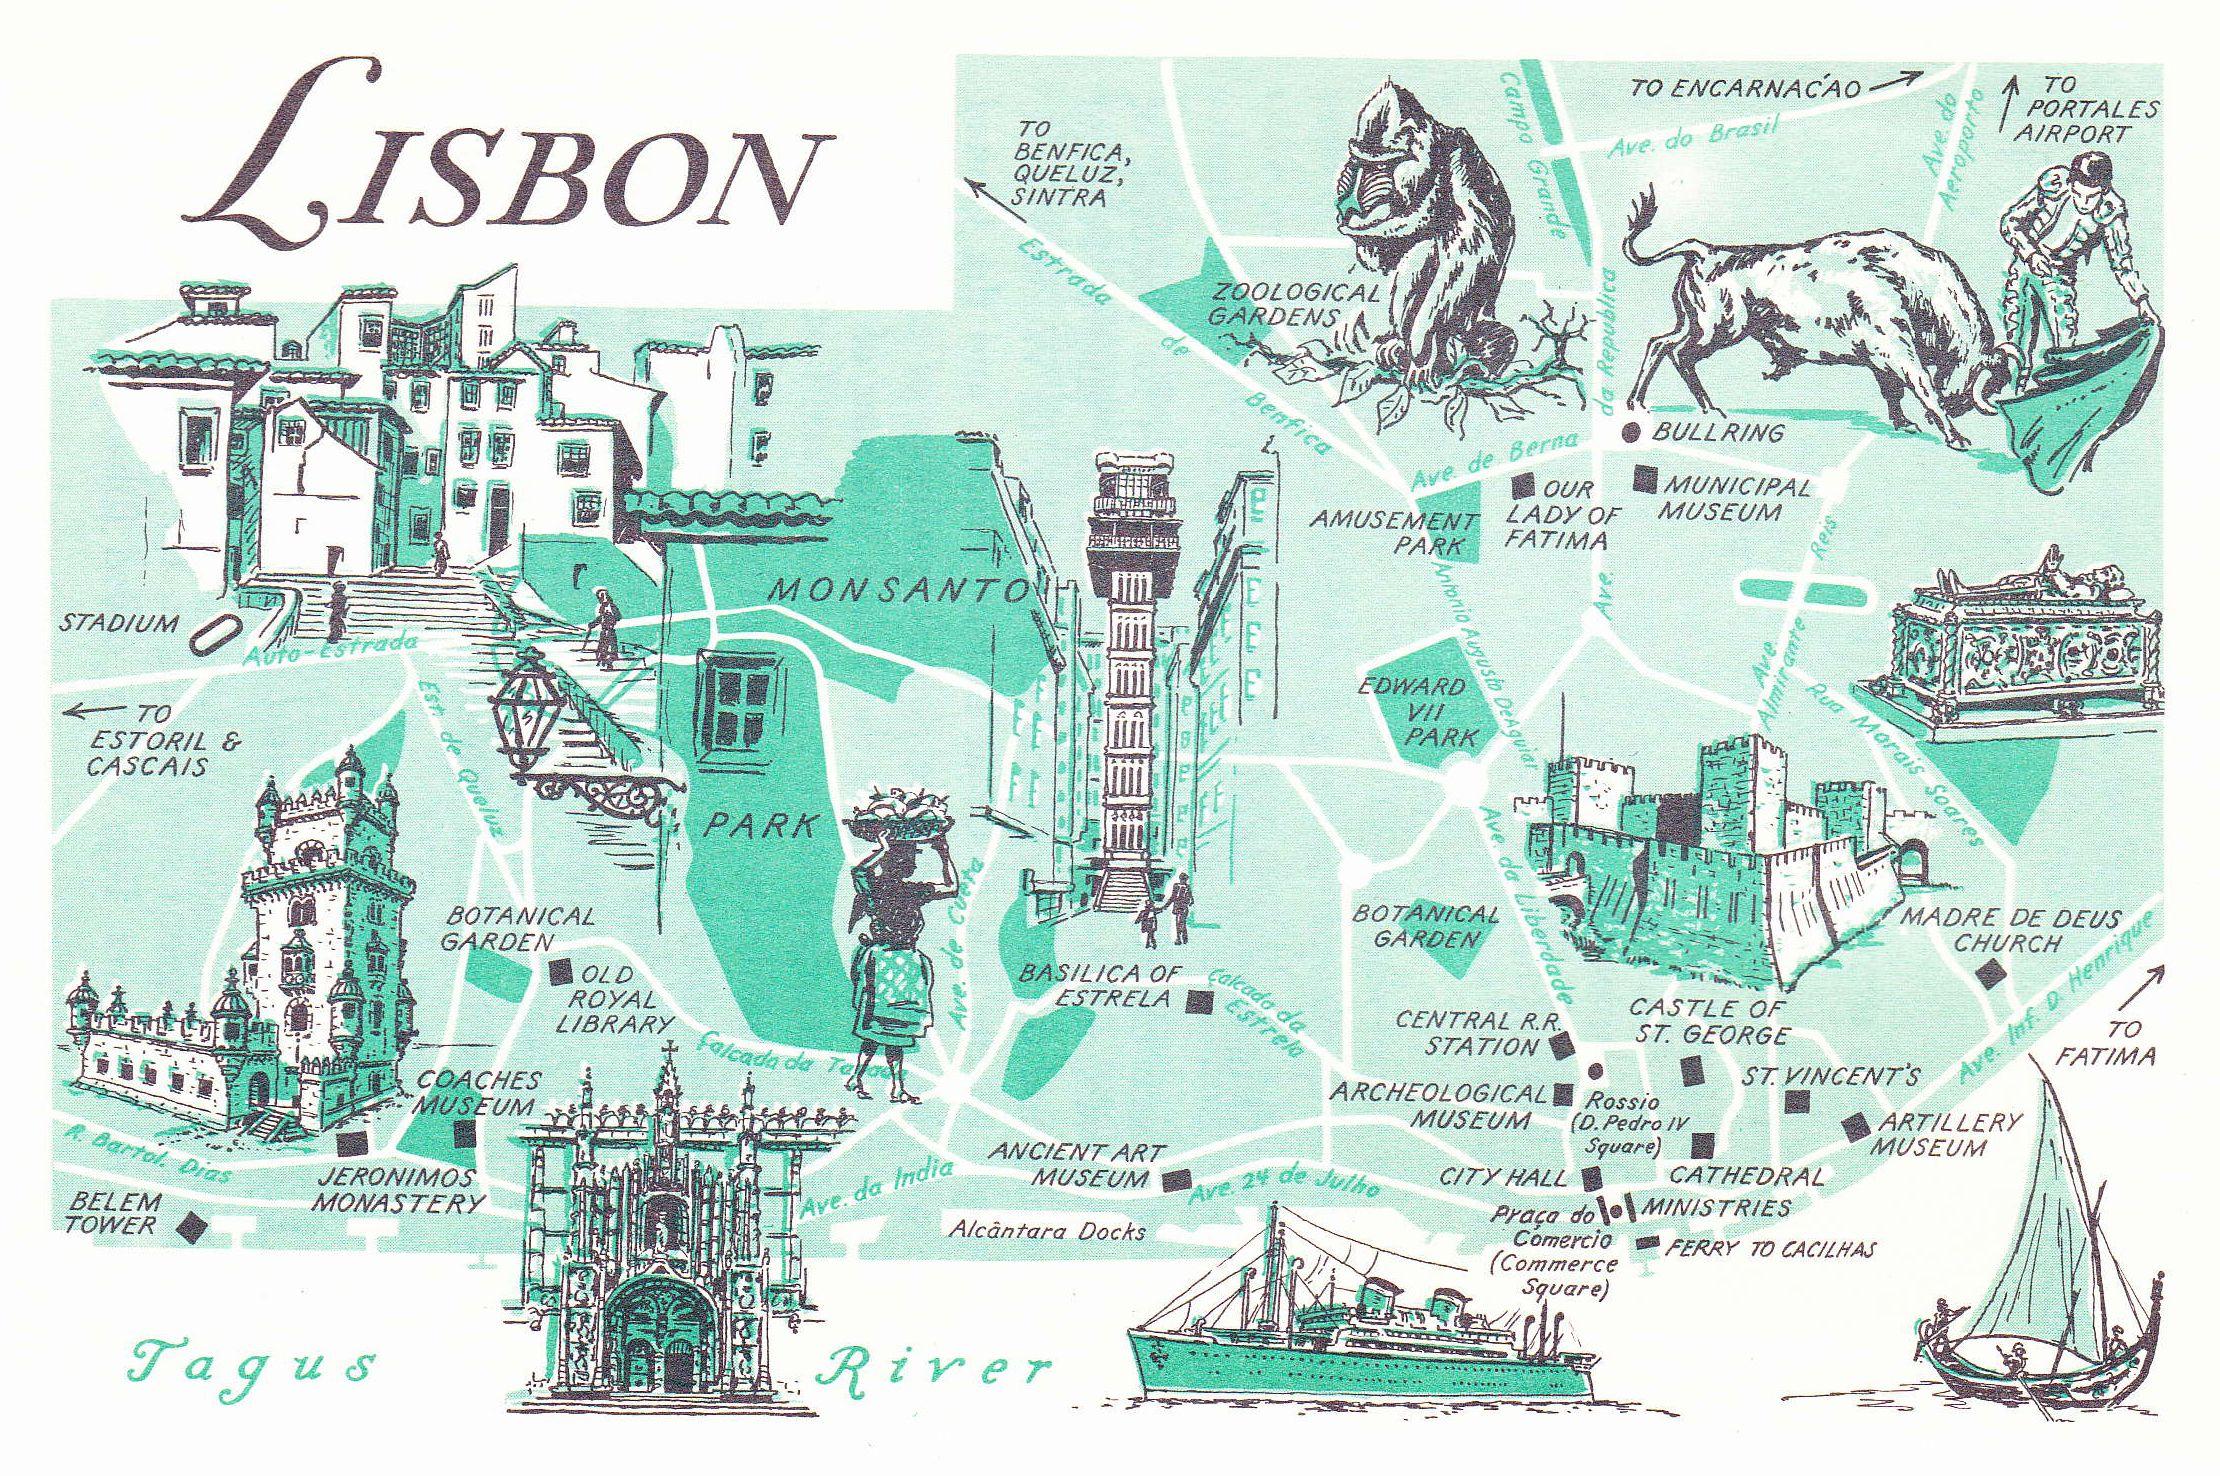 Old Map of Lisbon Portugal I gotta see this Pinterest Lisbon